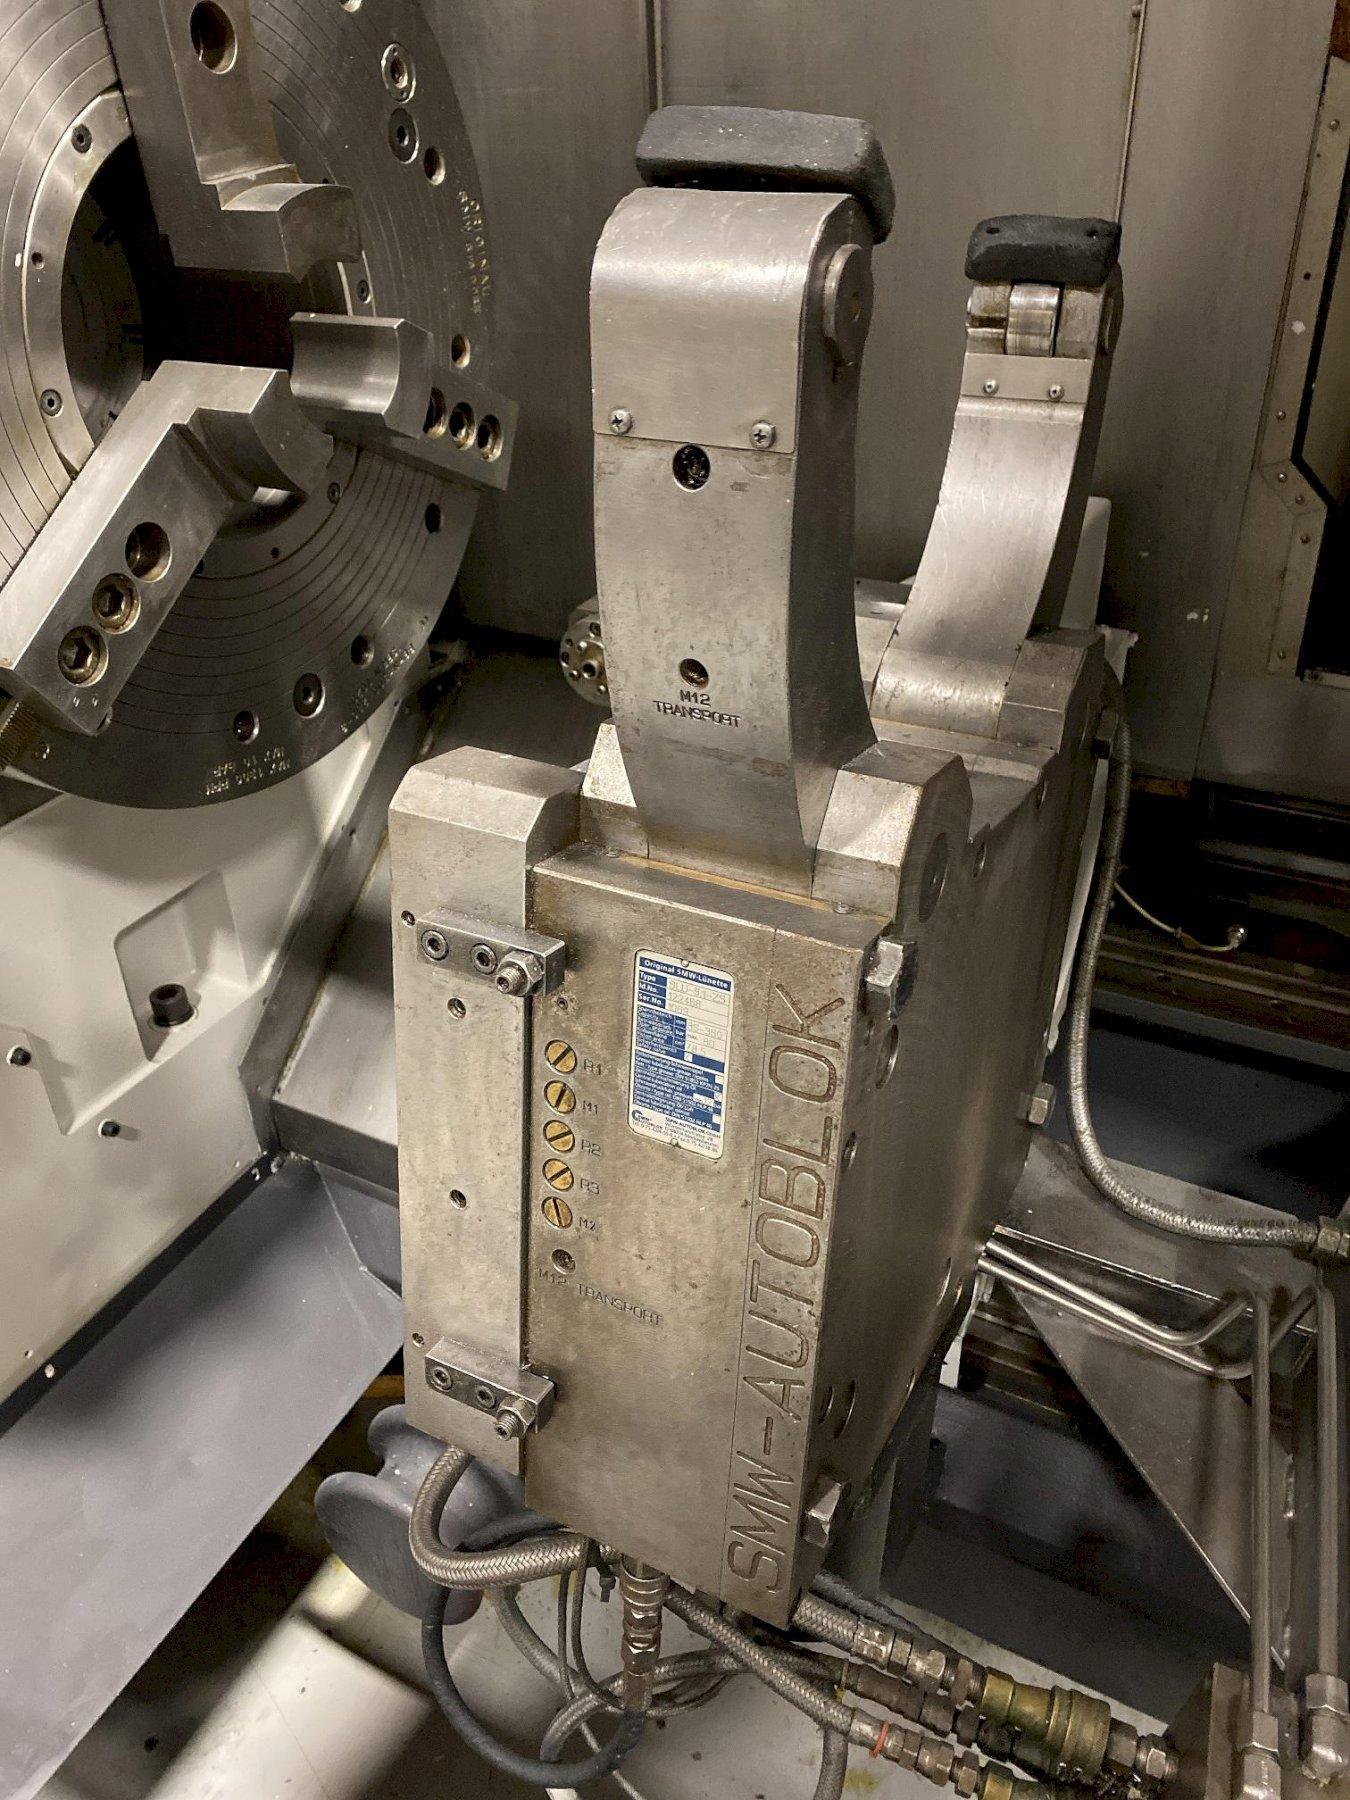 2003 MAZAK Integrex e650H/3000 CNC Horizontal Mill/Turn Lathe